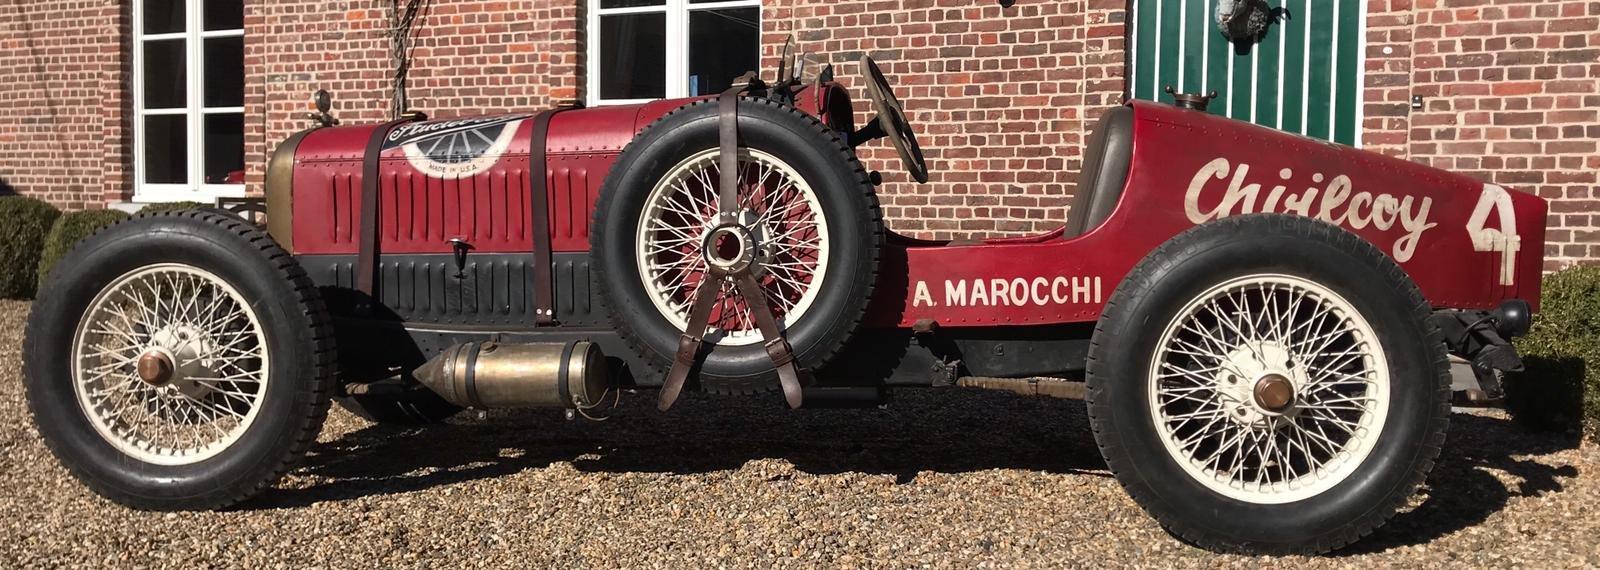 1925 Studebaker speedster For Sale (picture 2 of 6)